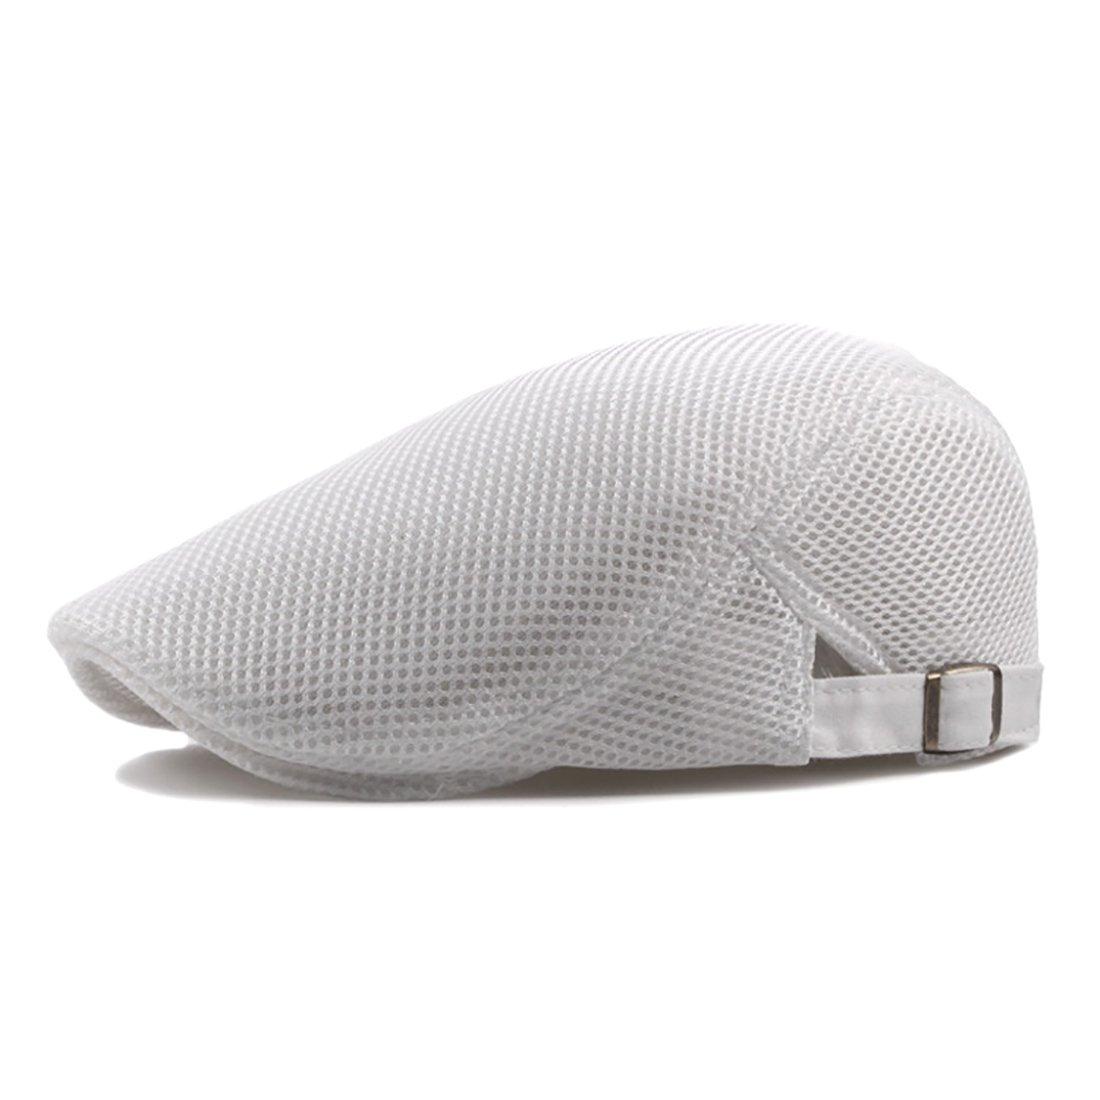 332e0b85a68 UNYU Men Breathable mesh Summer Hat Newsboy Beret Ivy Cap Cabbie Flat Cap  (White)  Amazon.co.uk  Clothing